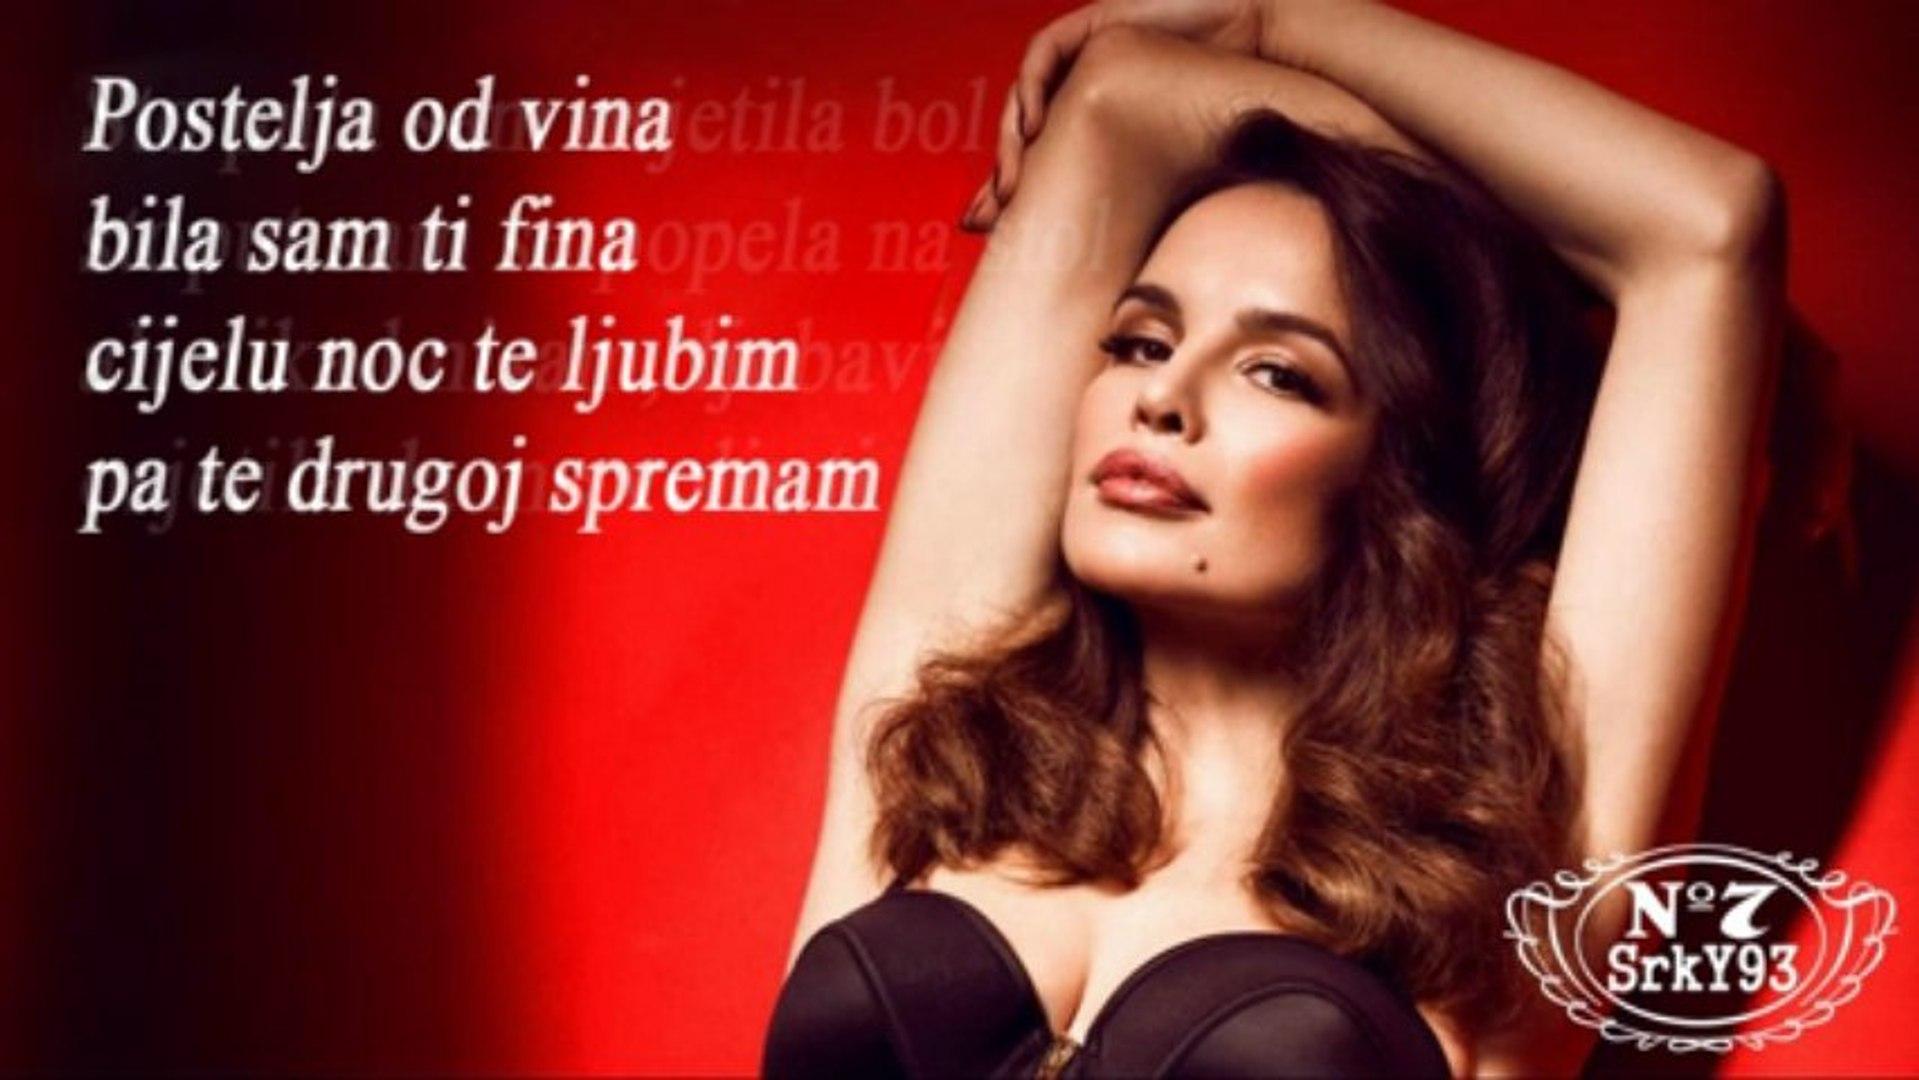 Severina - 2013 - 11 - Postelja od vina + Tekst